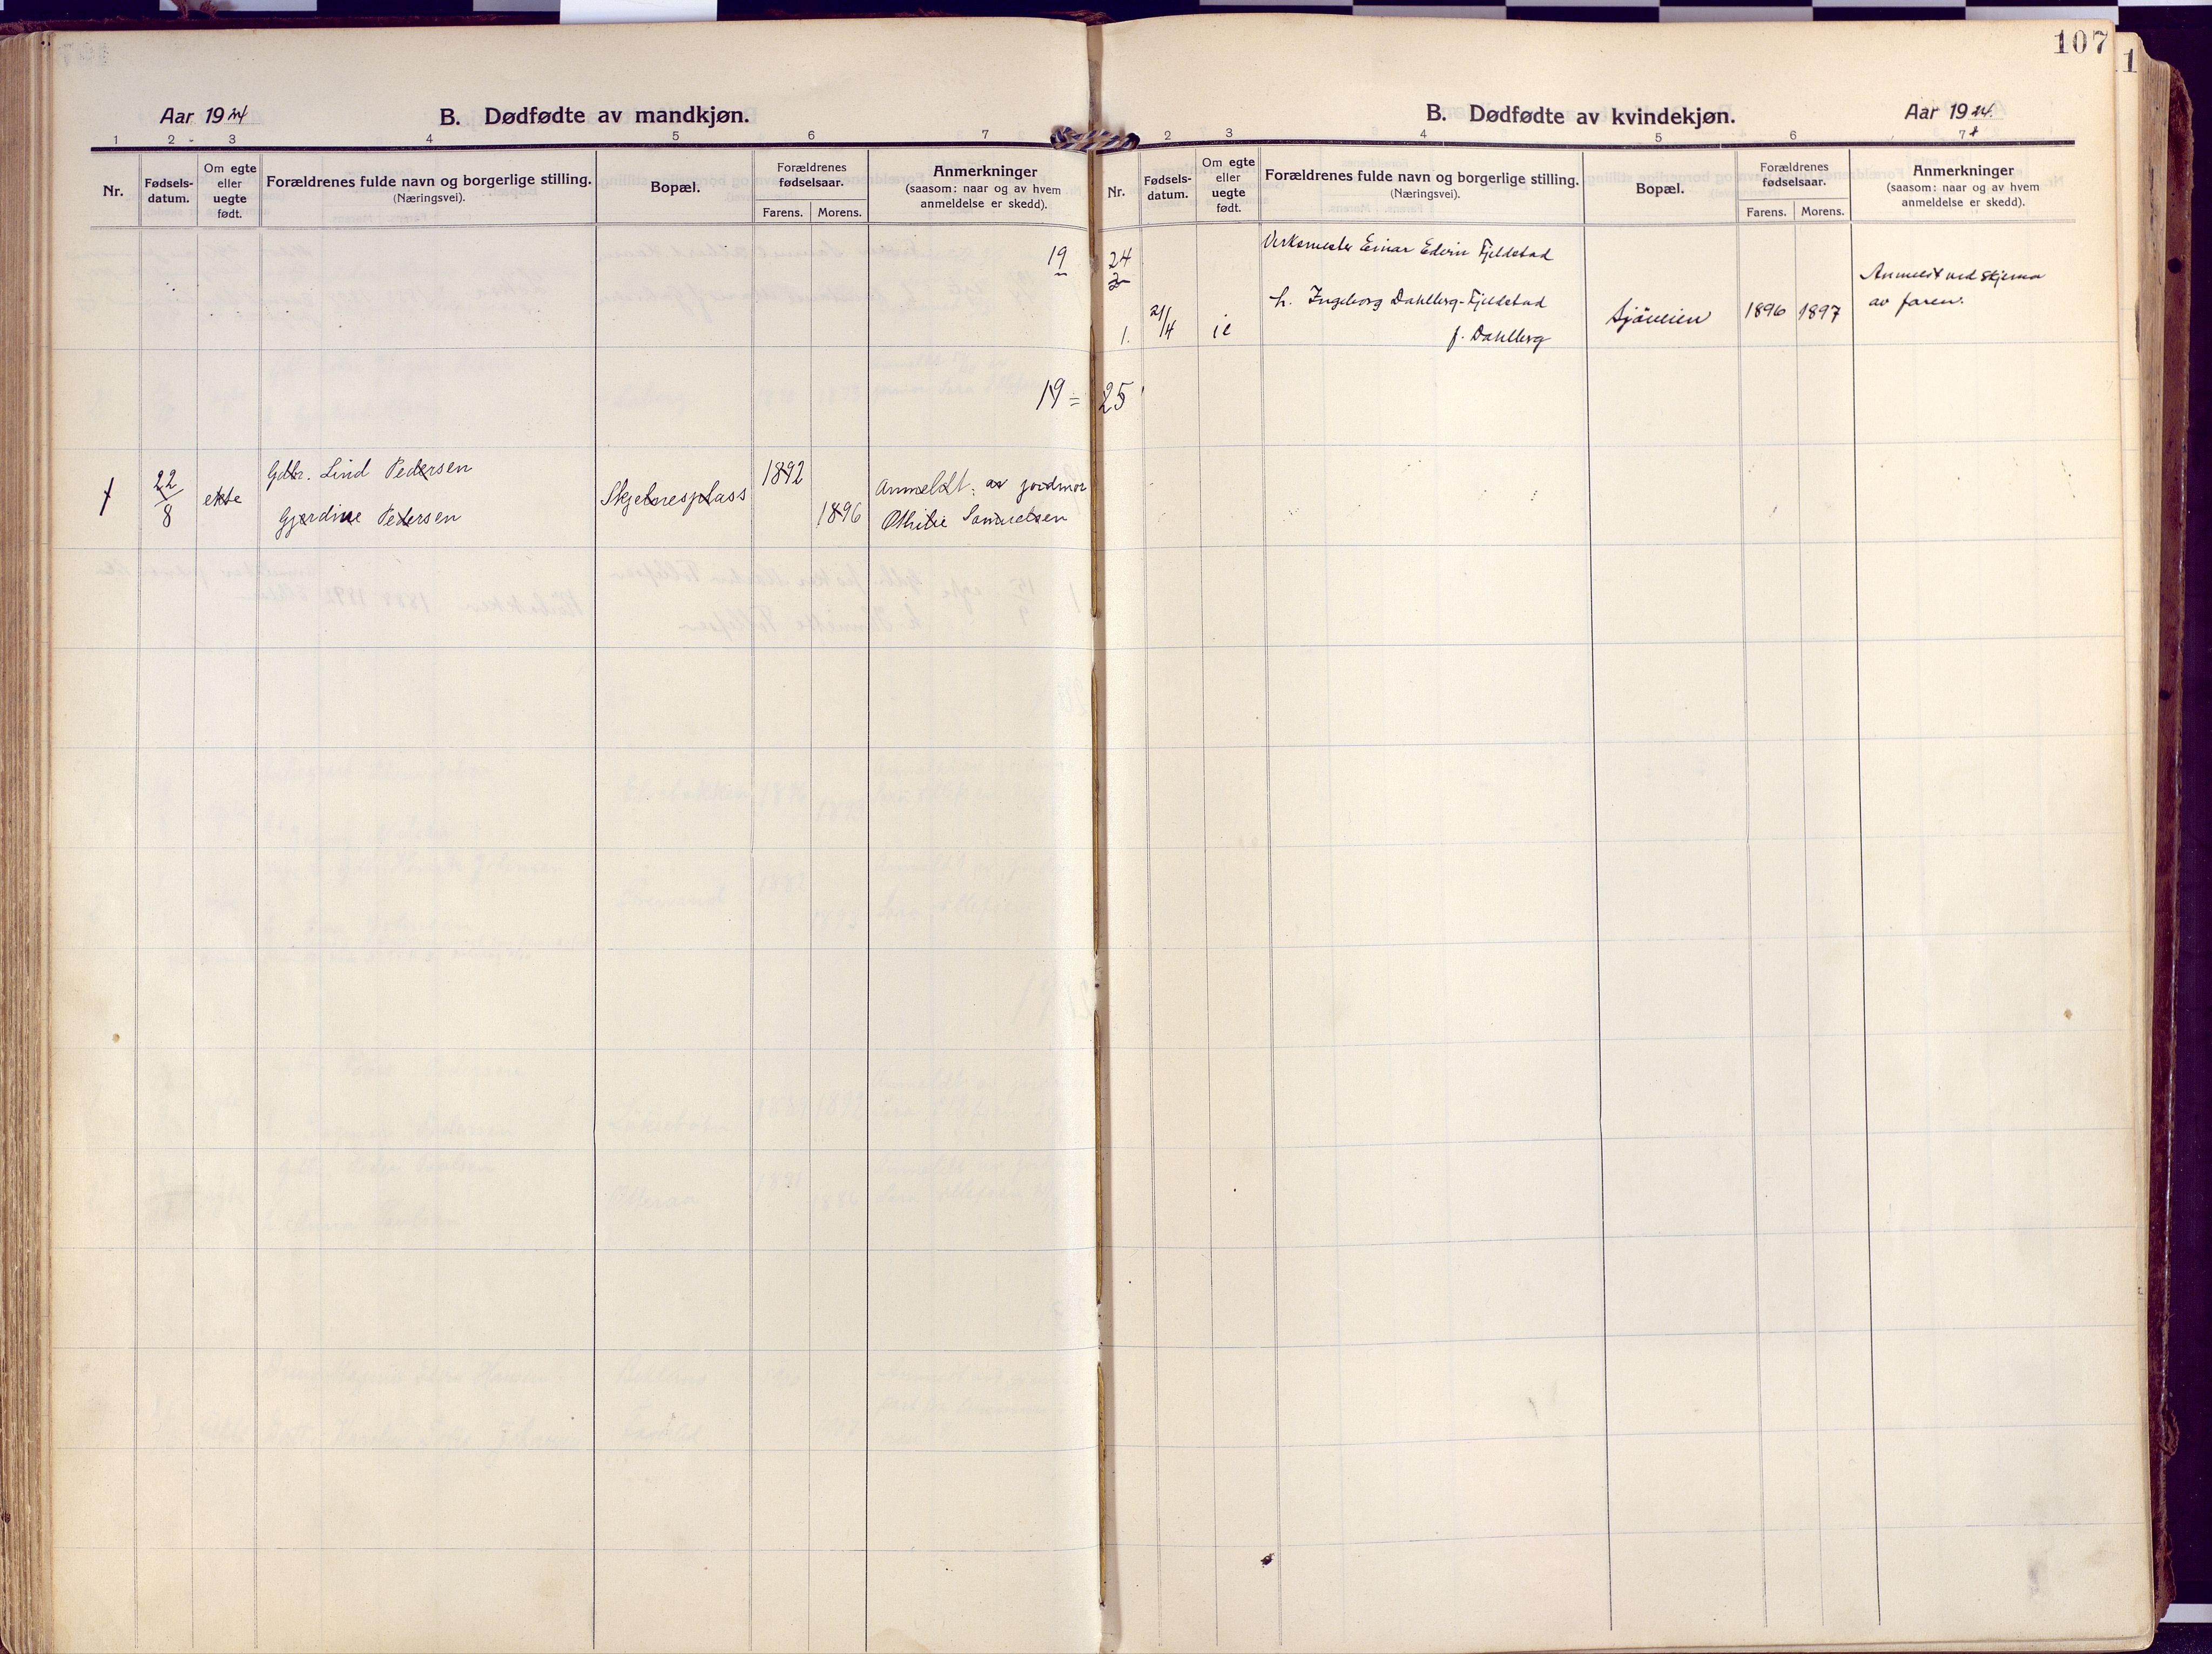 SATØ, Salangen sokneprestembete, Ministerialbok nr. 4, 1912-1927, s. 107